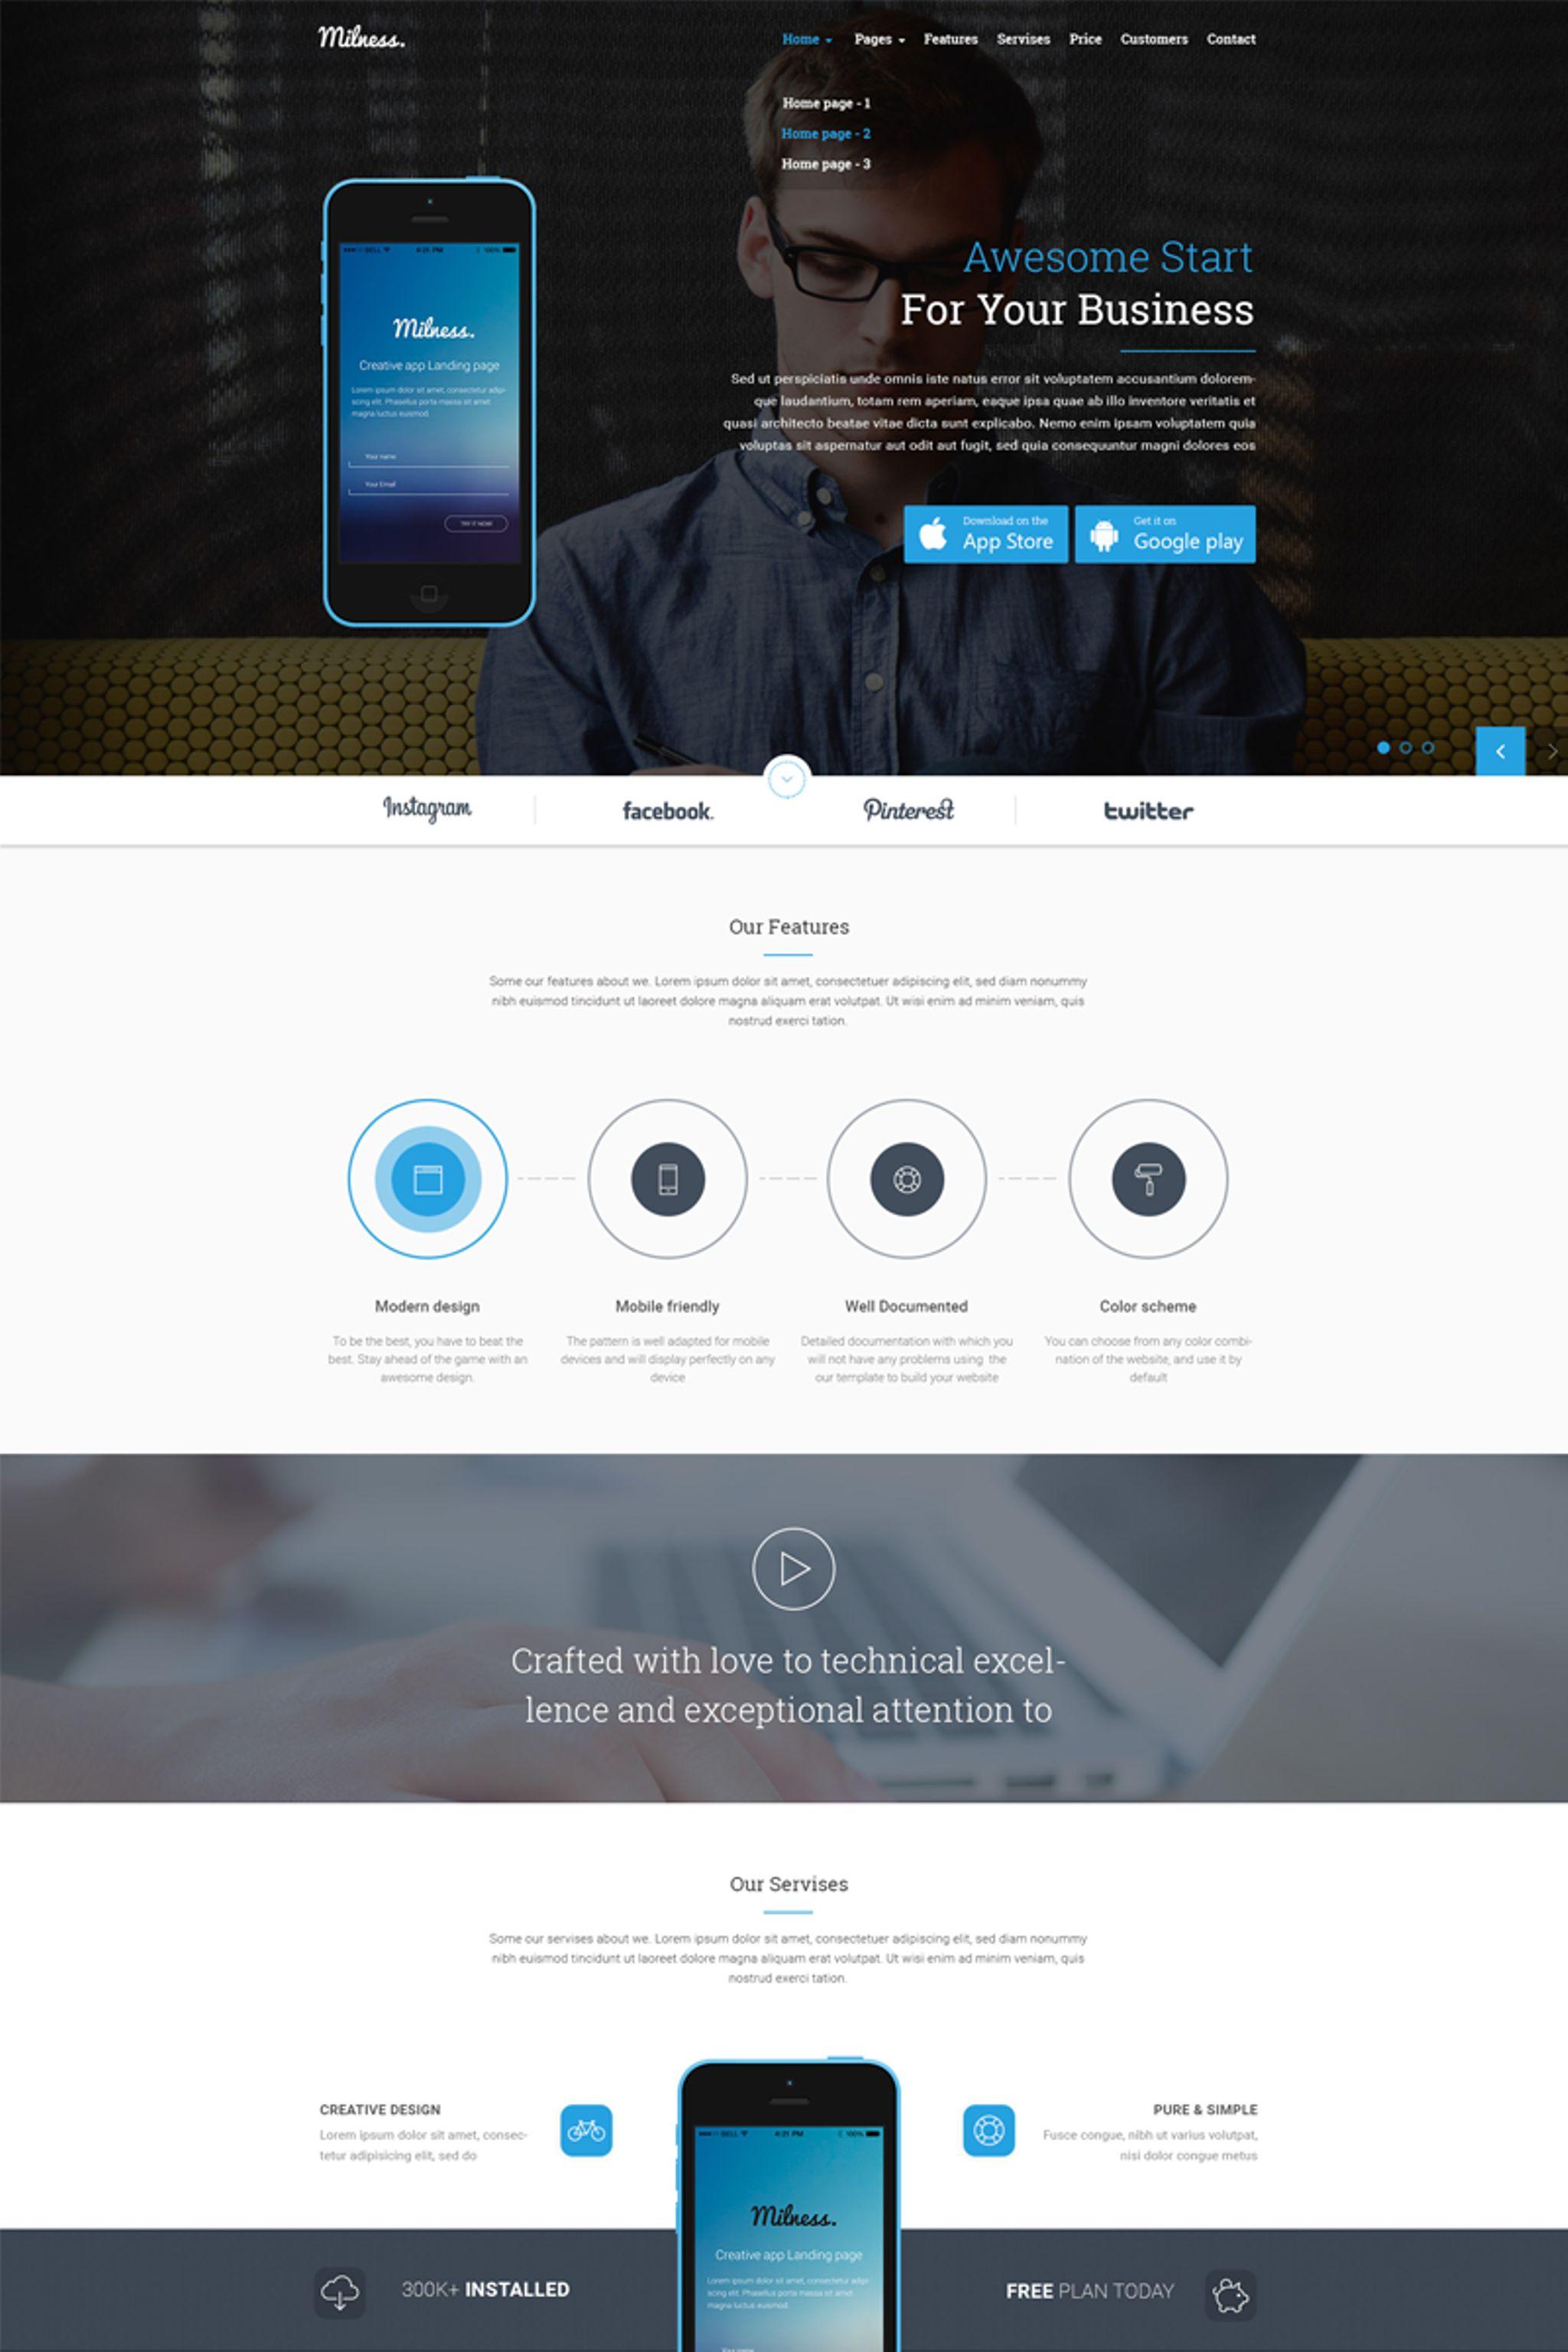 Milness - Showcase Mobile App Website Template